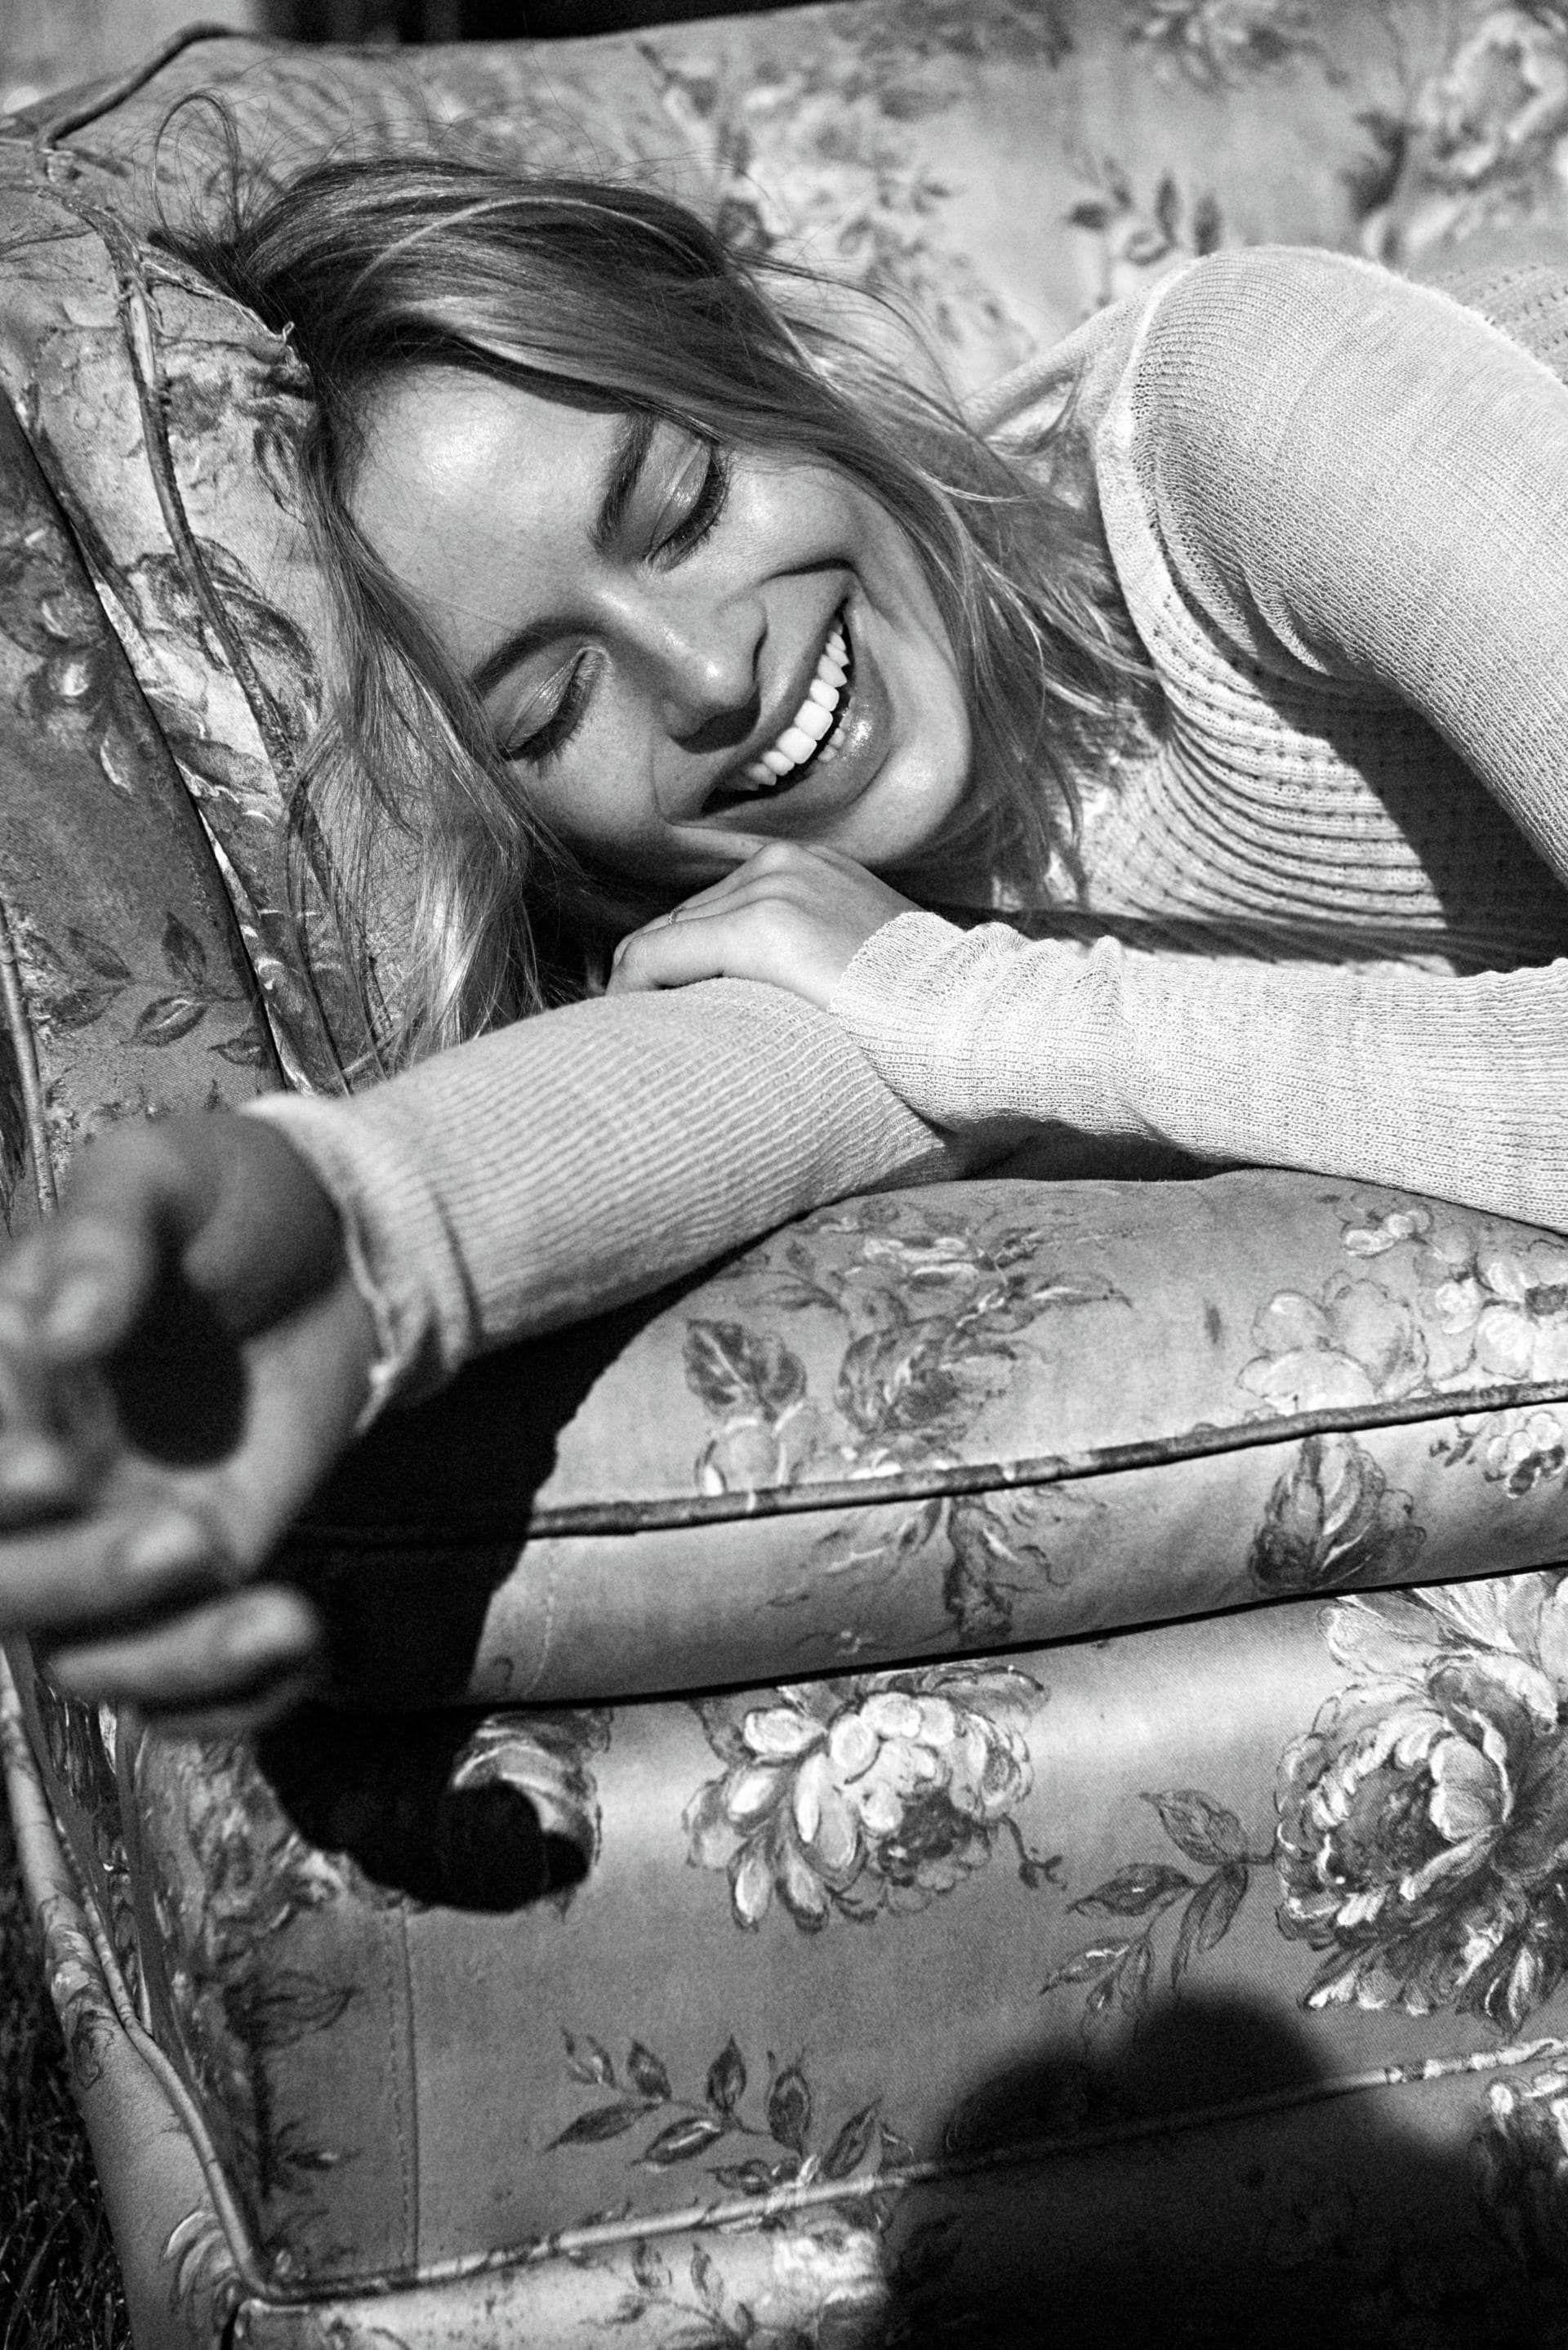 Margot Robbie for Vogue Australia December 2017 | FTAPE